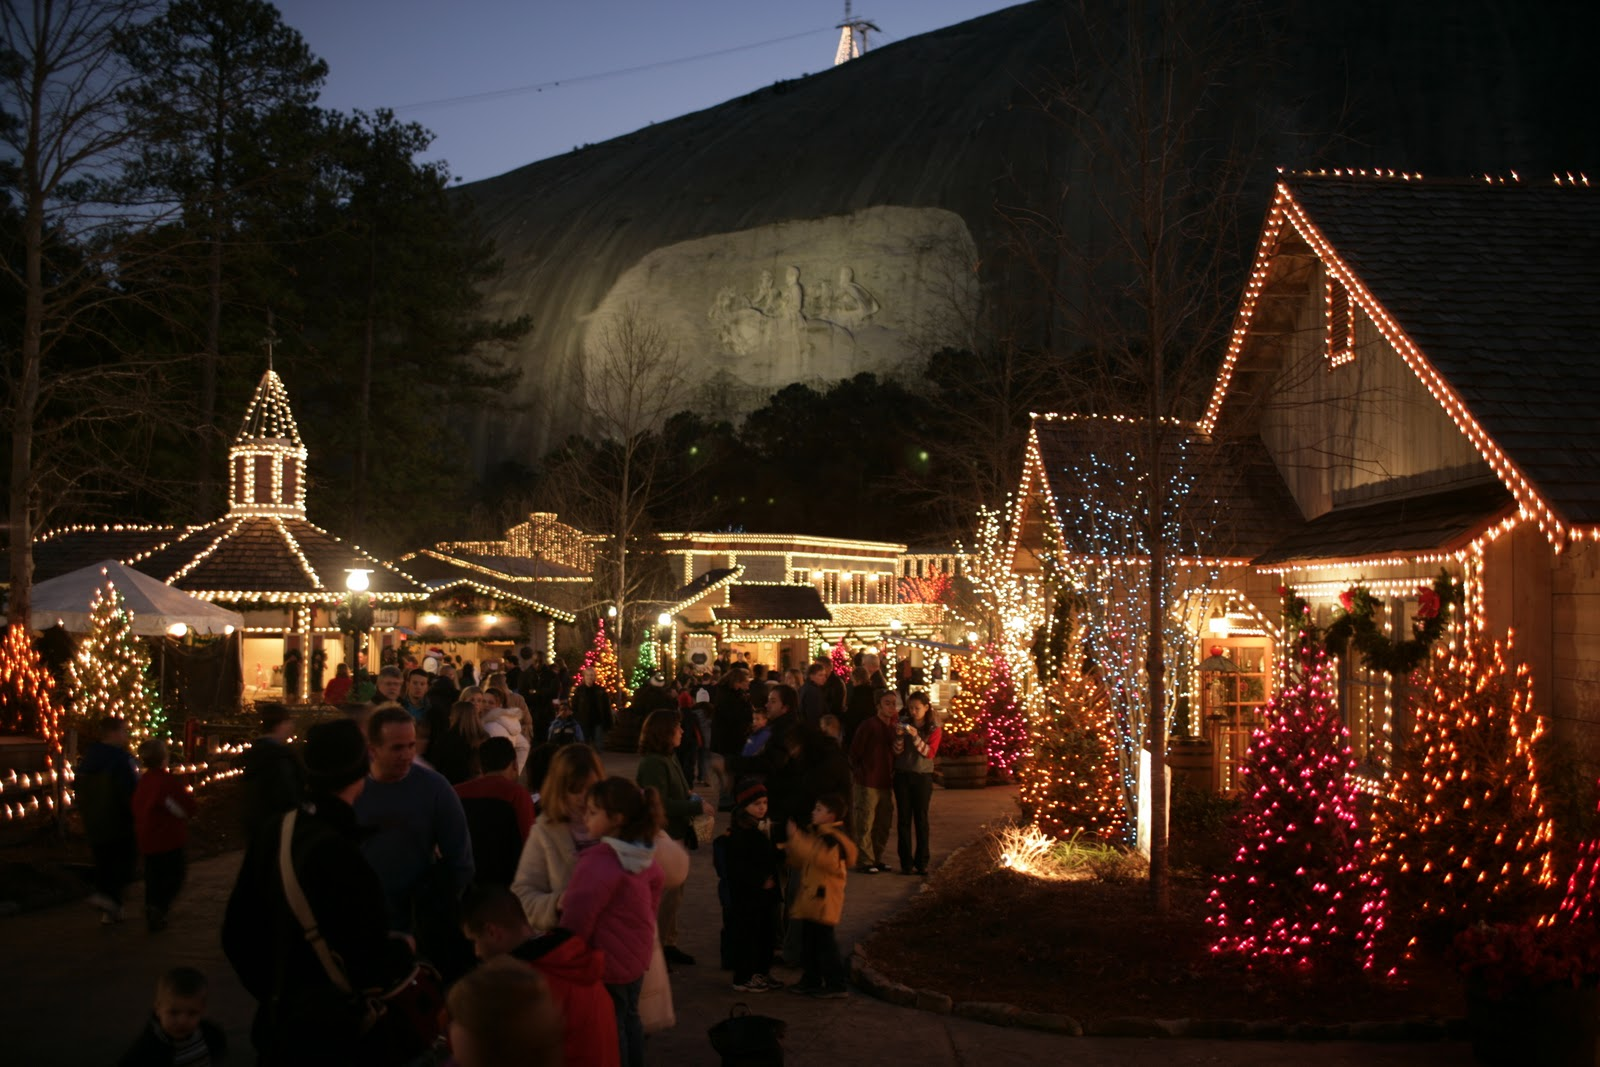 Stone Mountain Christmas Lights Up Atlanta's DeKalb County ...